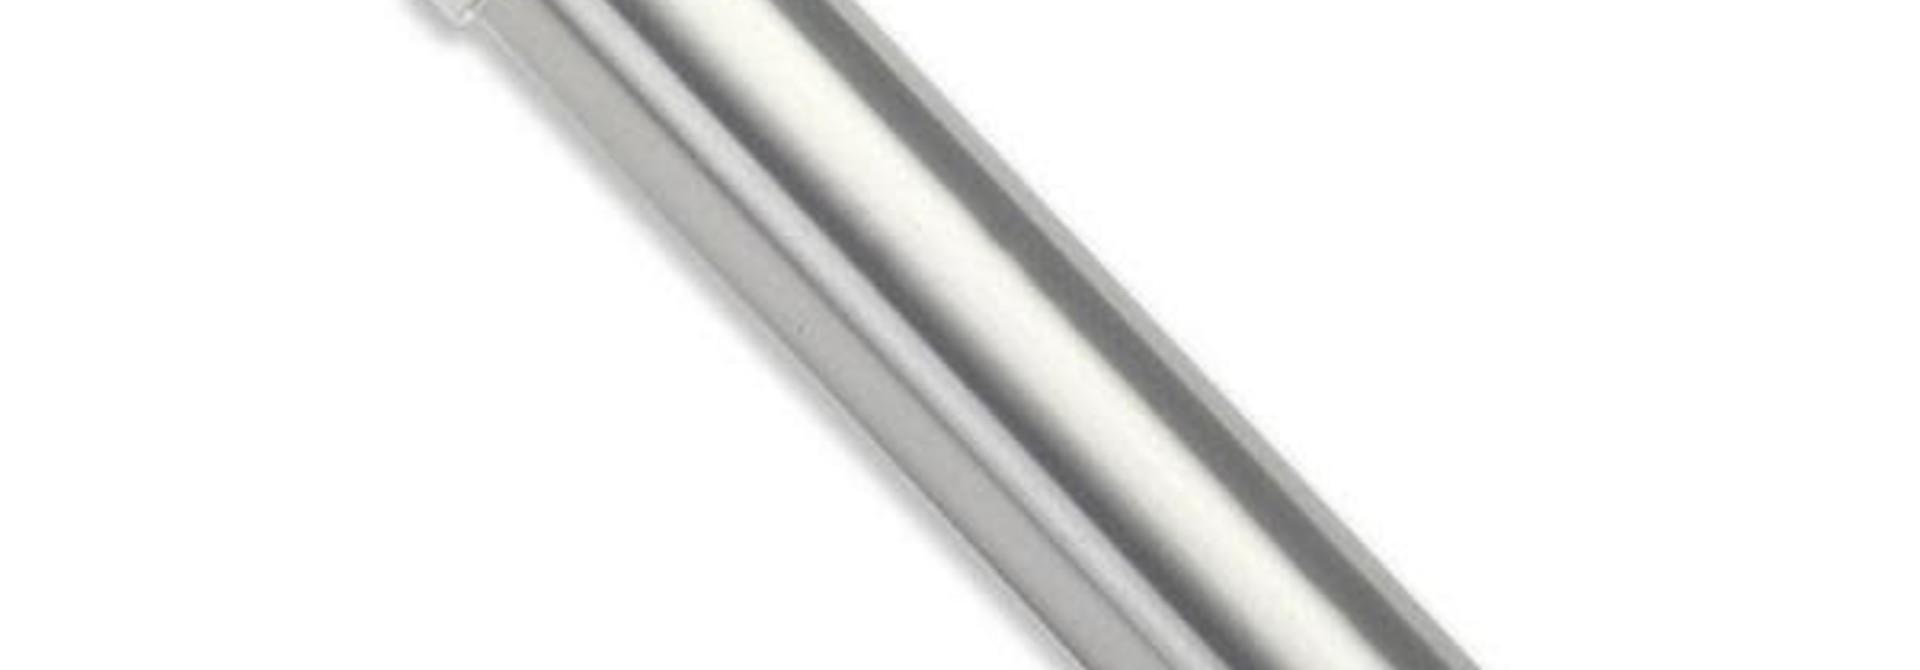 Body, GTR shock, 77mm, silver aluminum (rear, no threads)